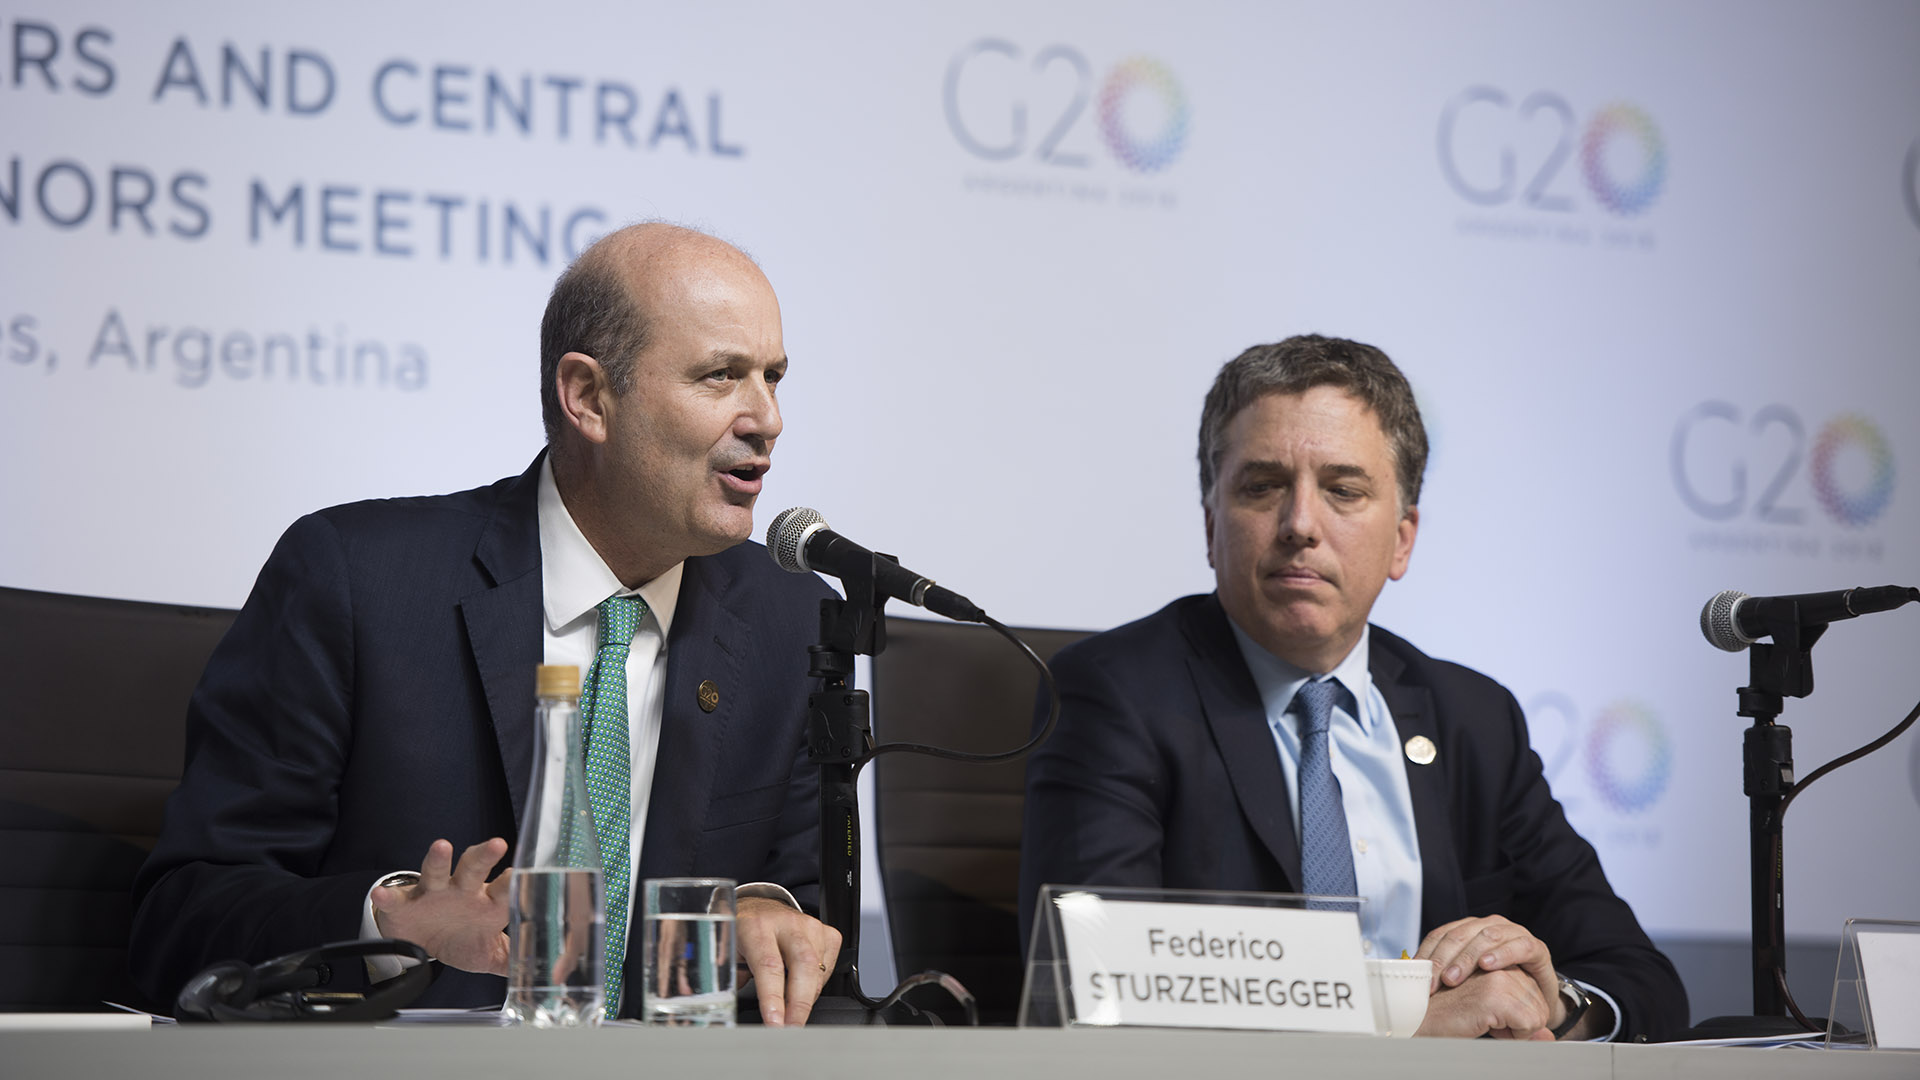 El presidente del BCRA, Fedrico Sturzenegger, junto al ministro Nicolás Dujovne. (Adrián Escandar)